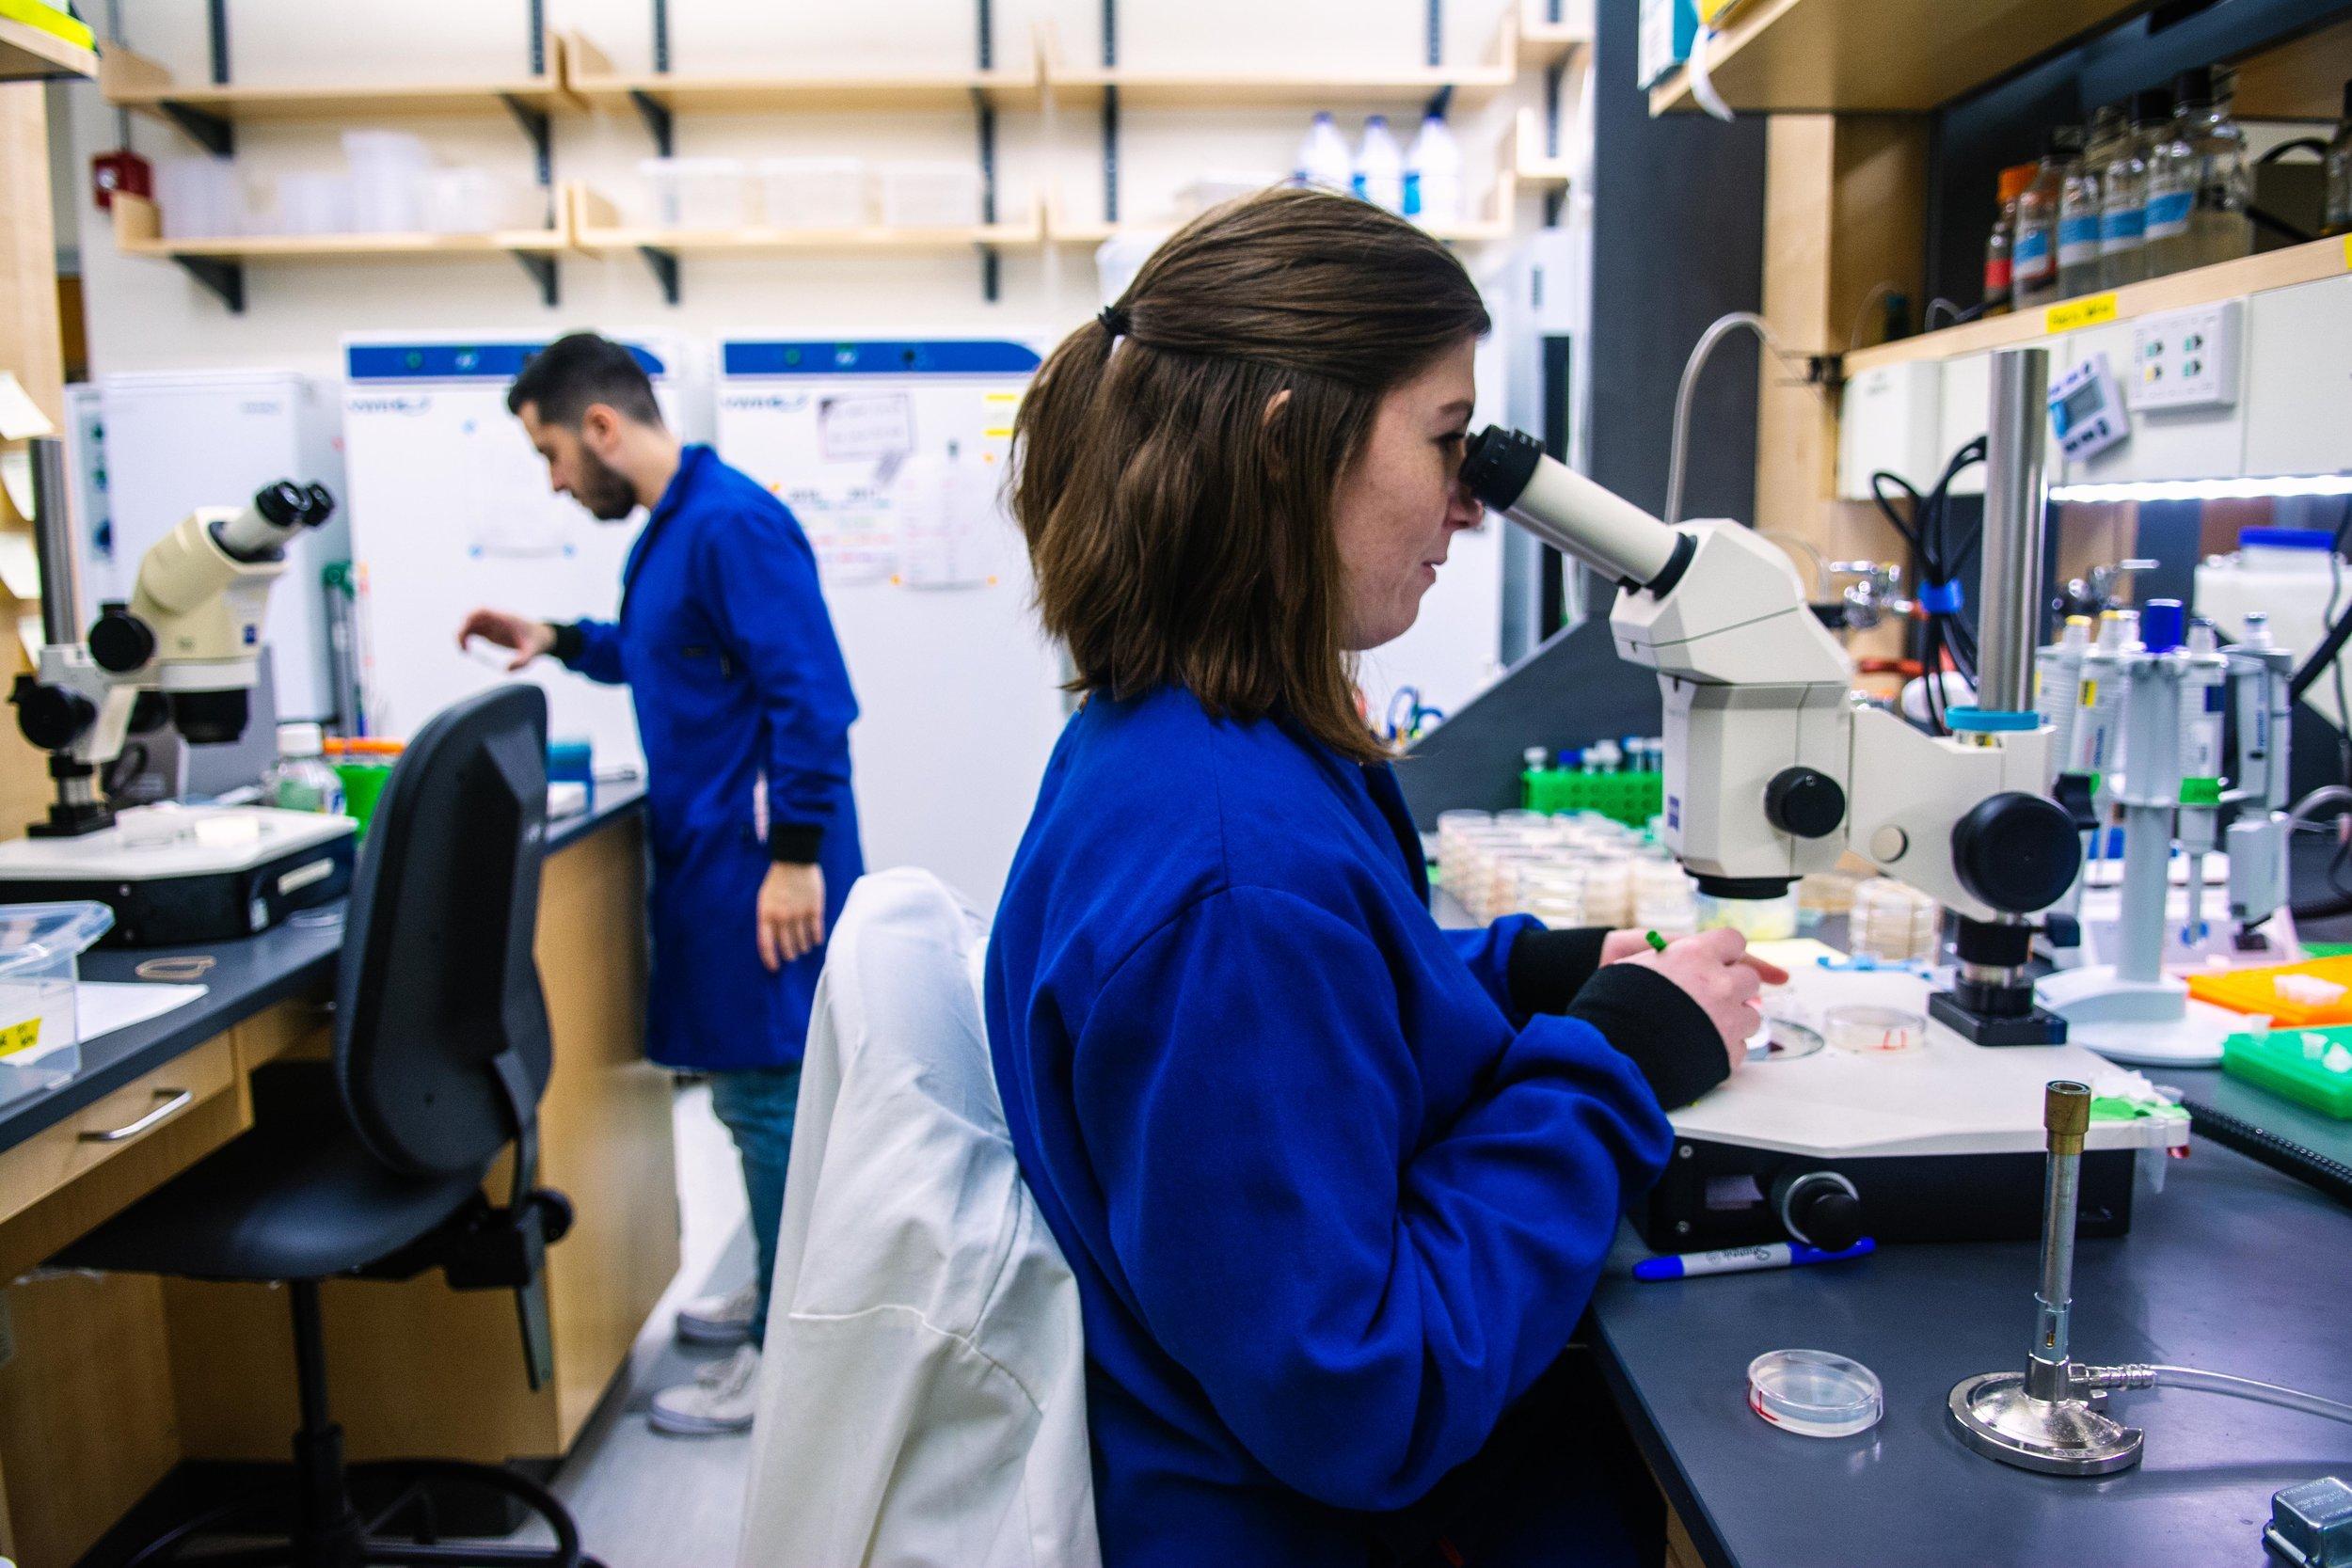 Graduate student Jodie Norris sorts C. elegans worms in the Apfeld Lab.